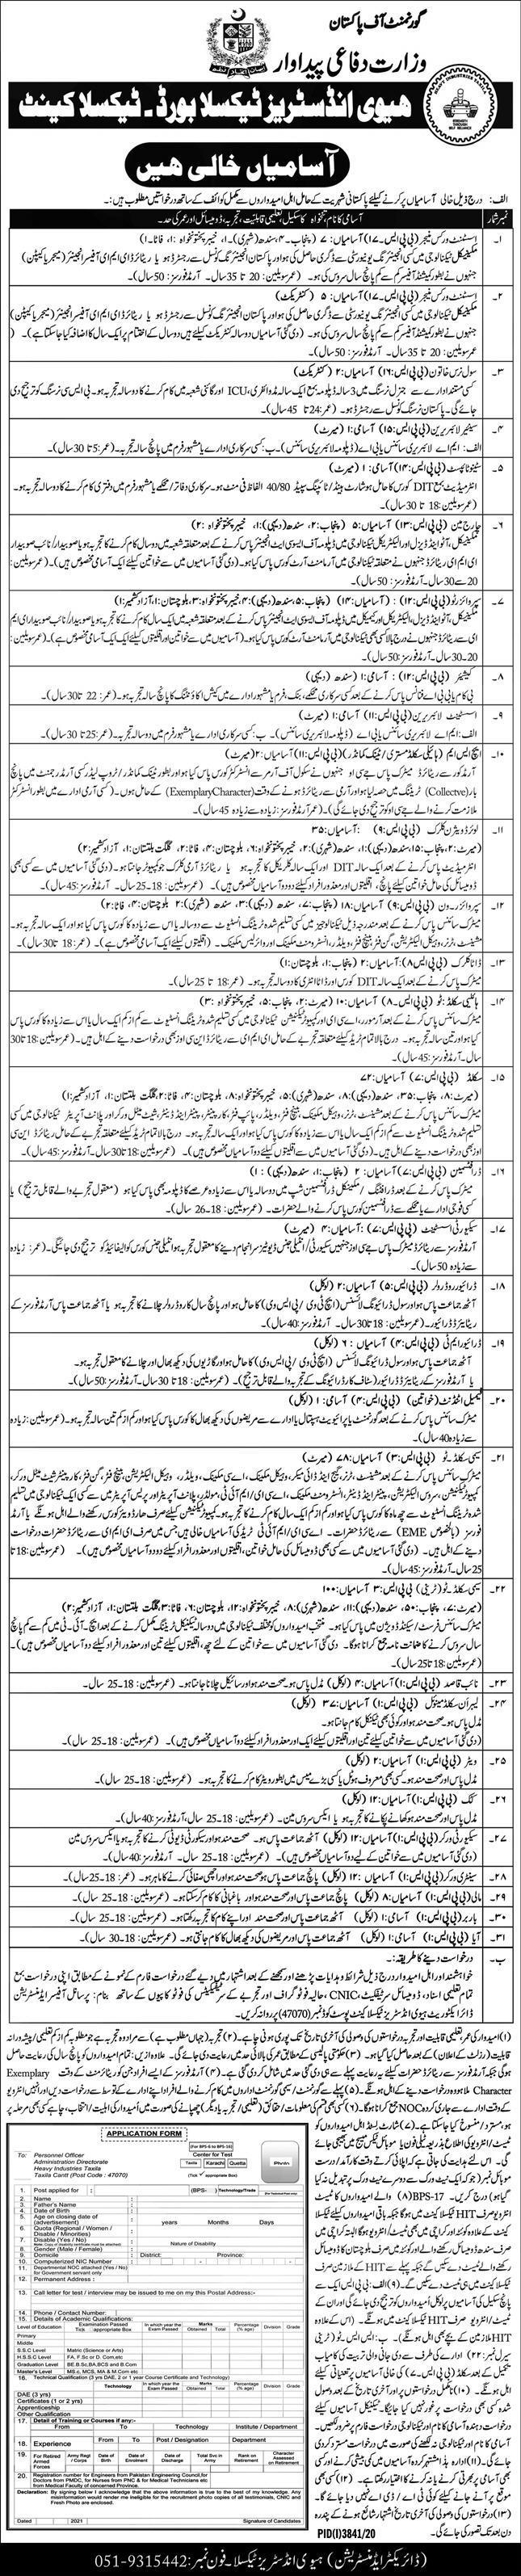 Heavy Industries Taxila Jobs 2021 – HIT Jobs 2021| Application Form| www.merenukkri.com